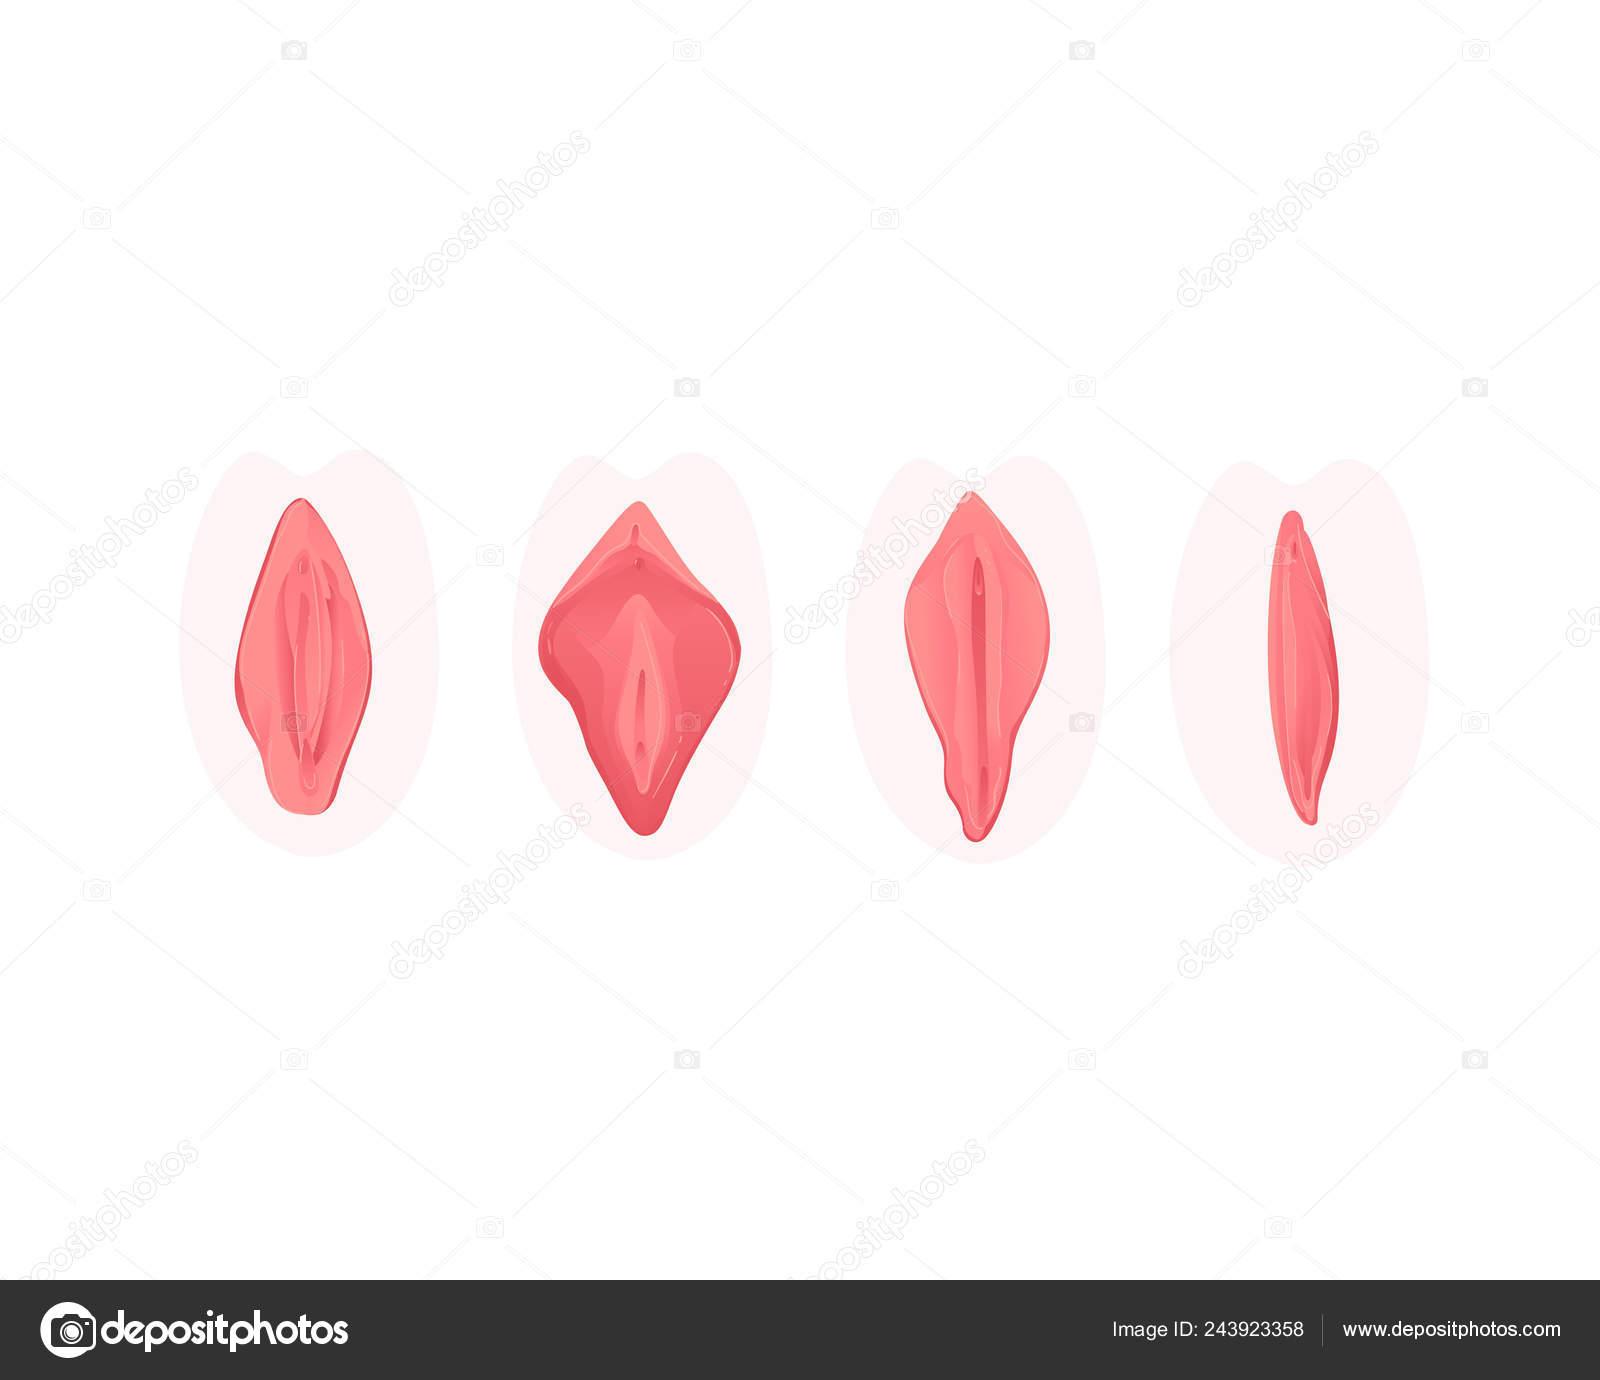 stock foto dydziai genitaliju nariu